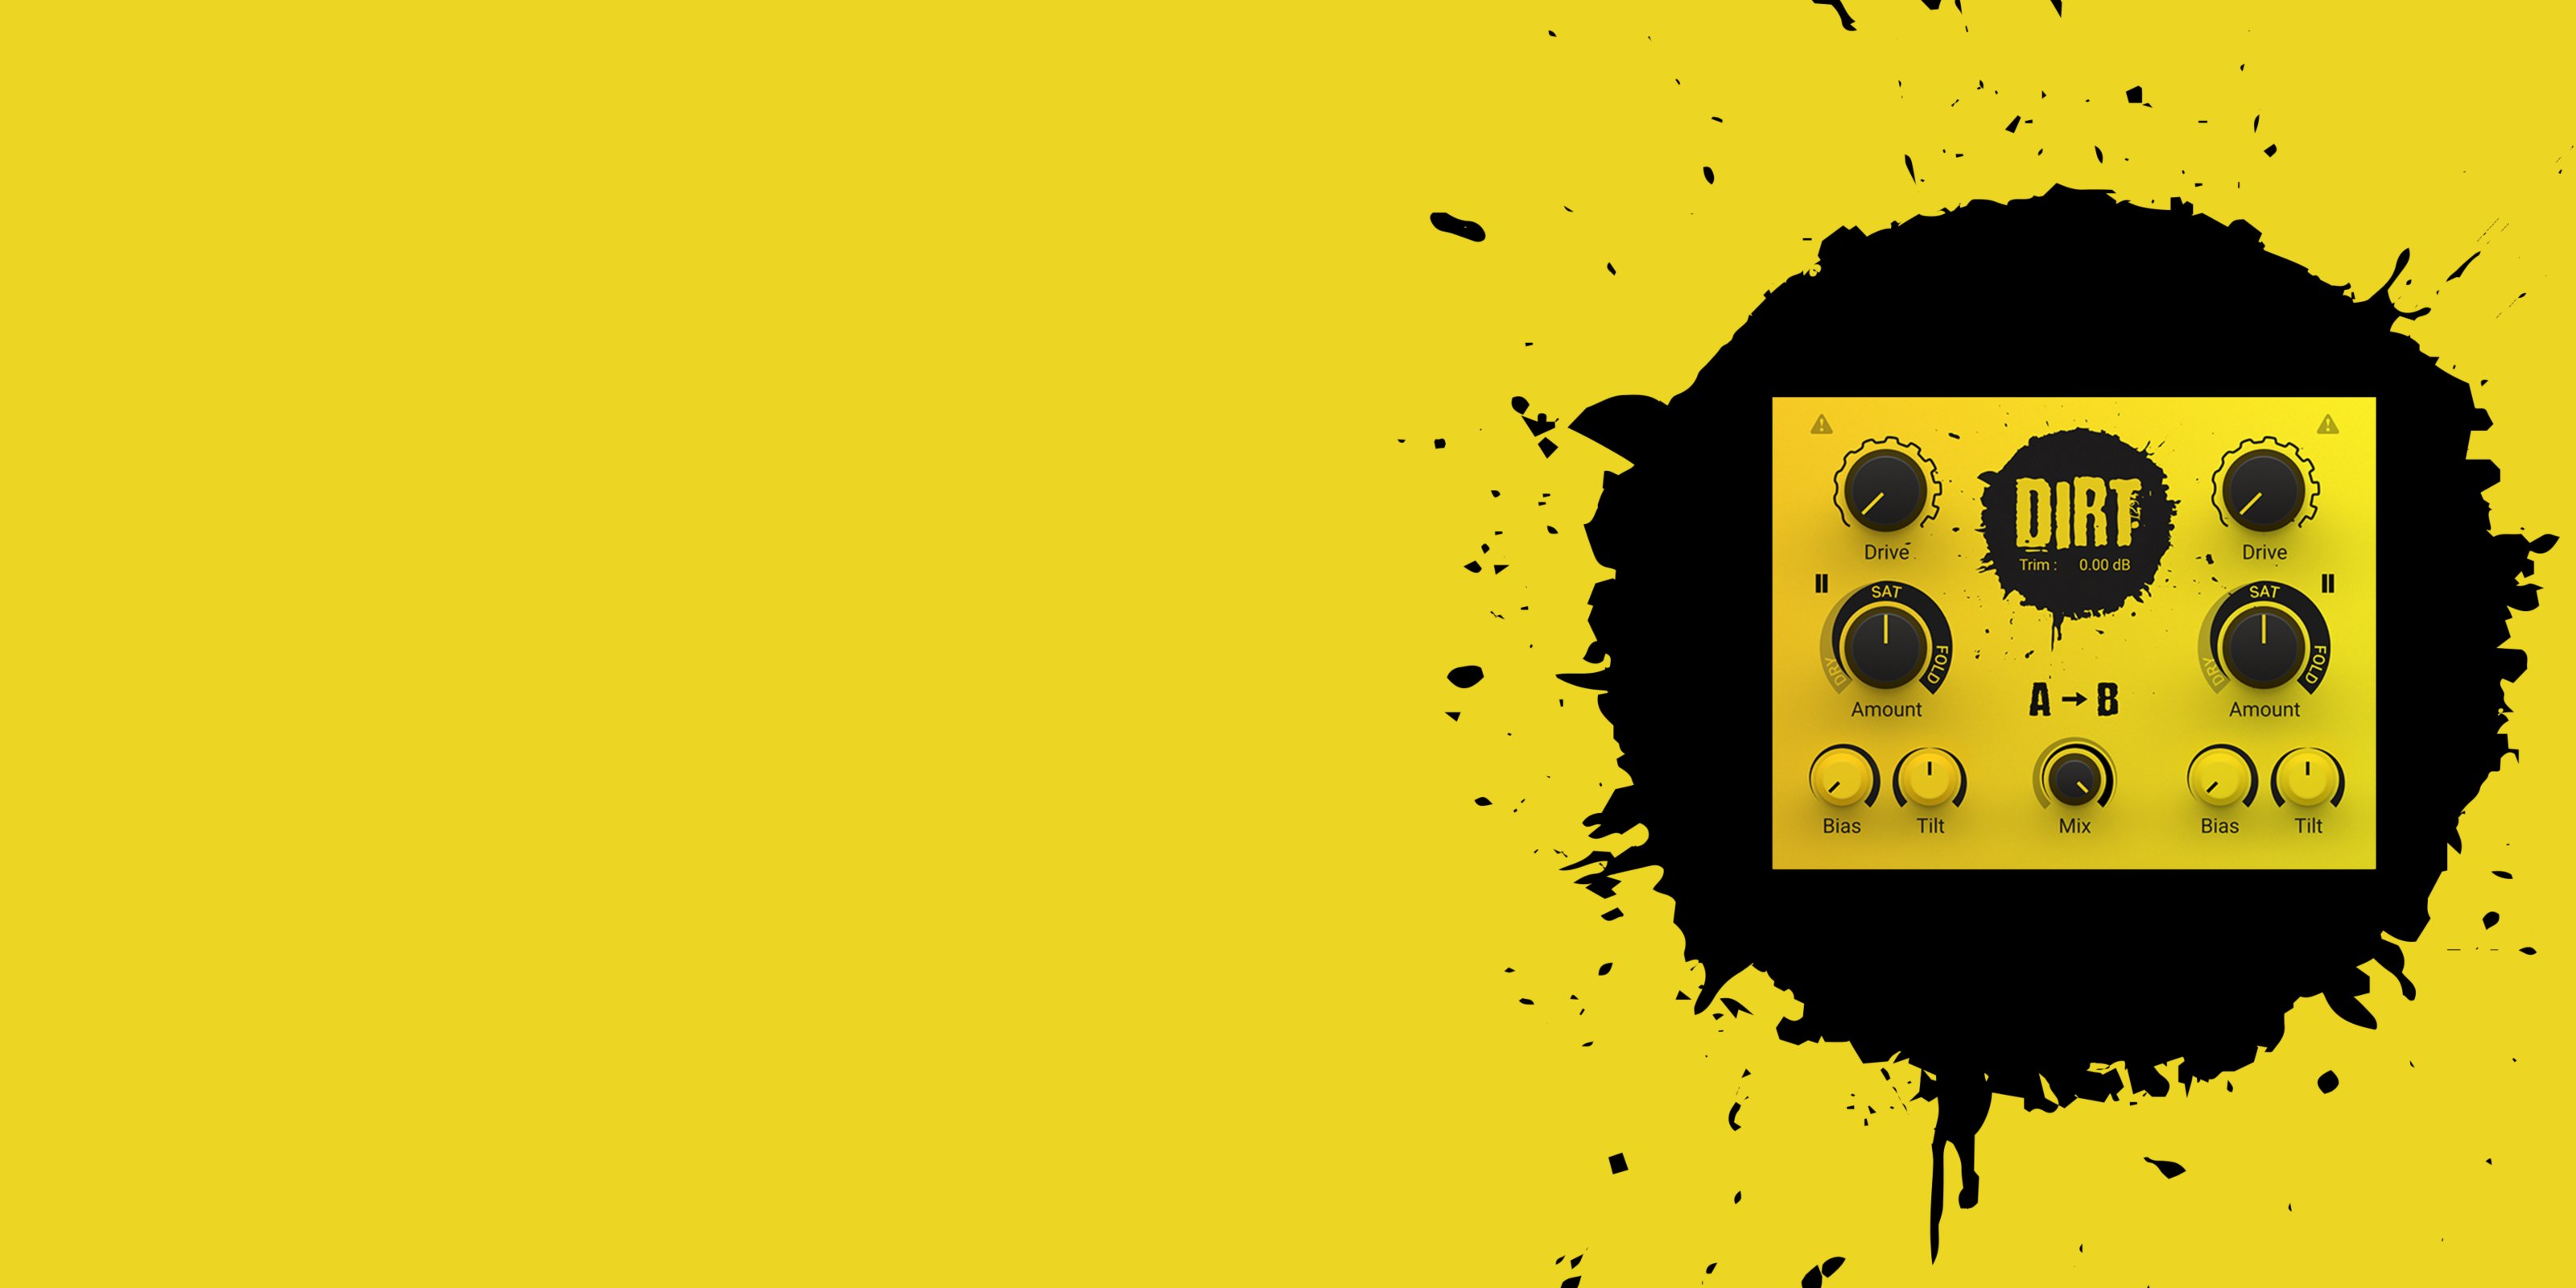 Native Instruments Dirt Mac 破解版 有机声音失真效果插件